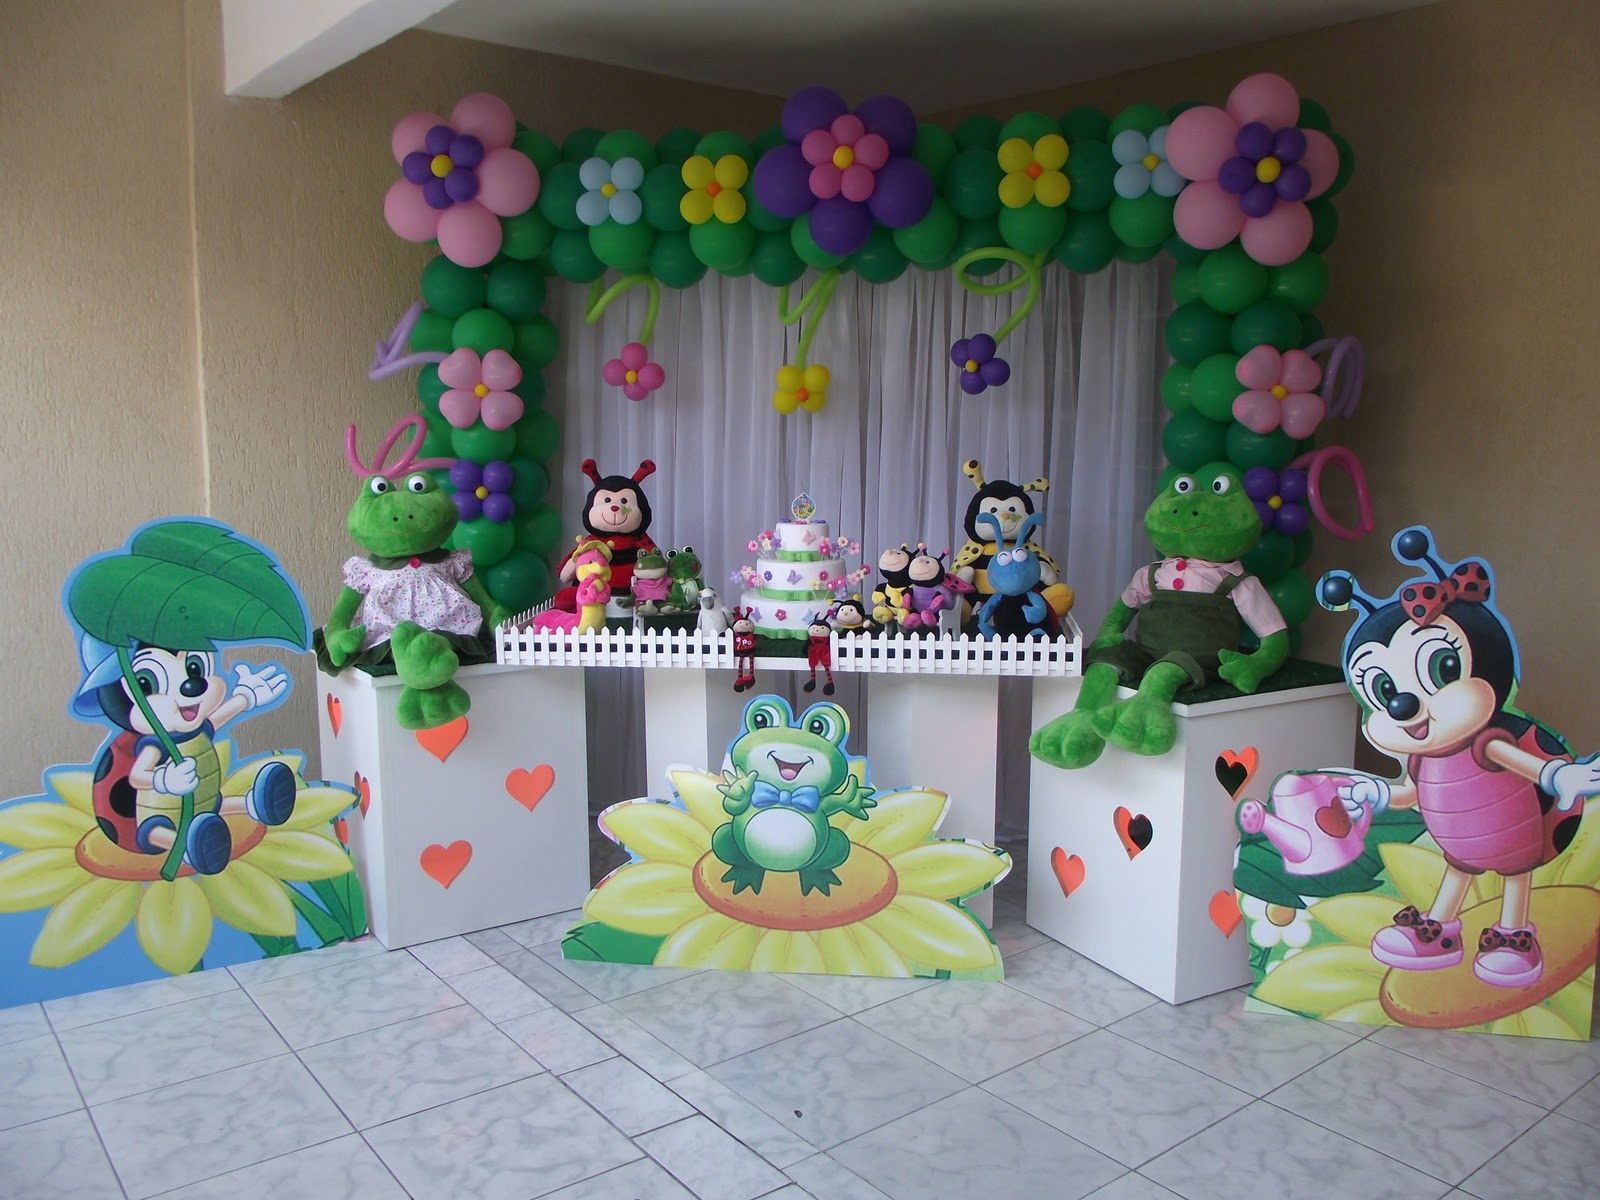 mesa infantil jardim:Enfeites De Mesa Festa Infantil Princesas Minnie E Jardim Encantado